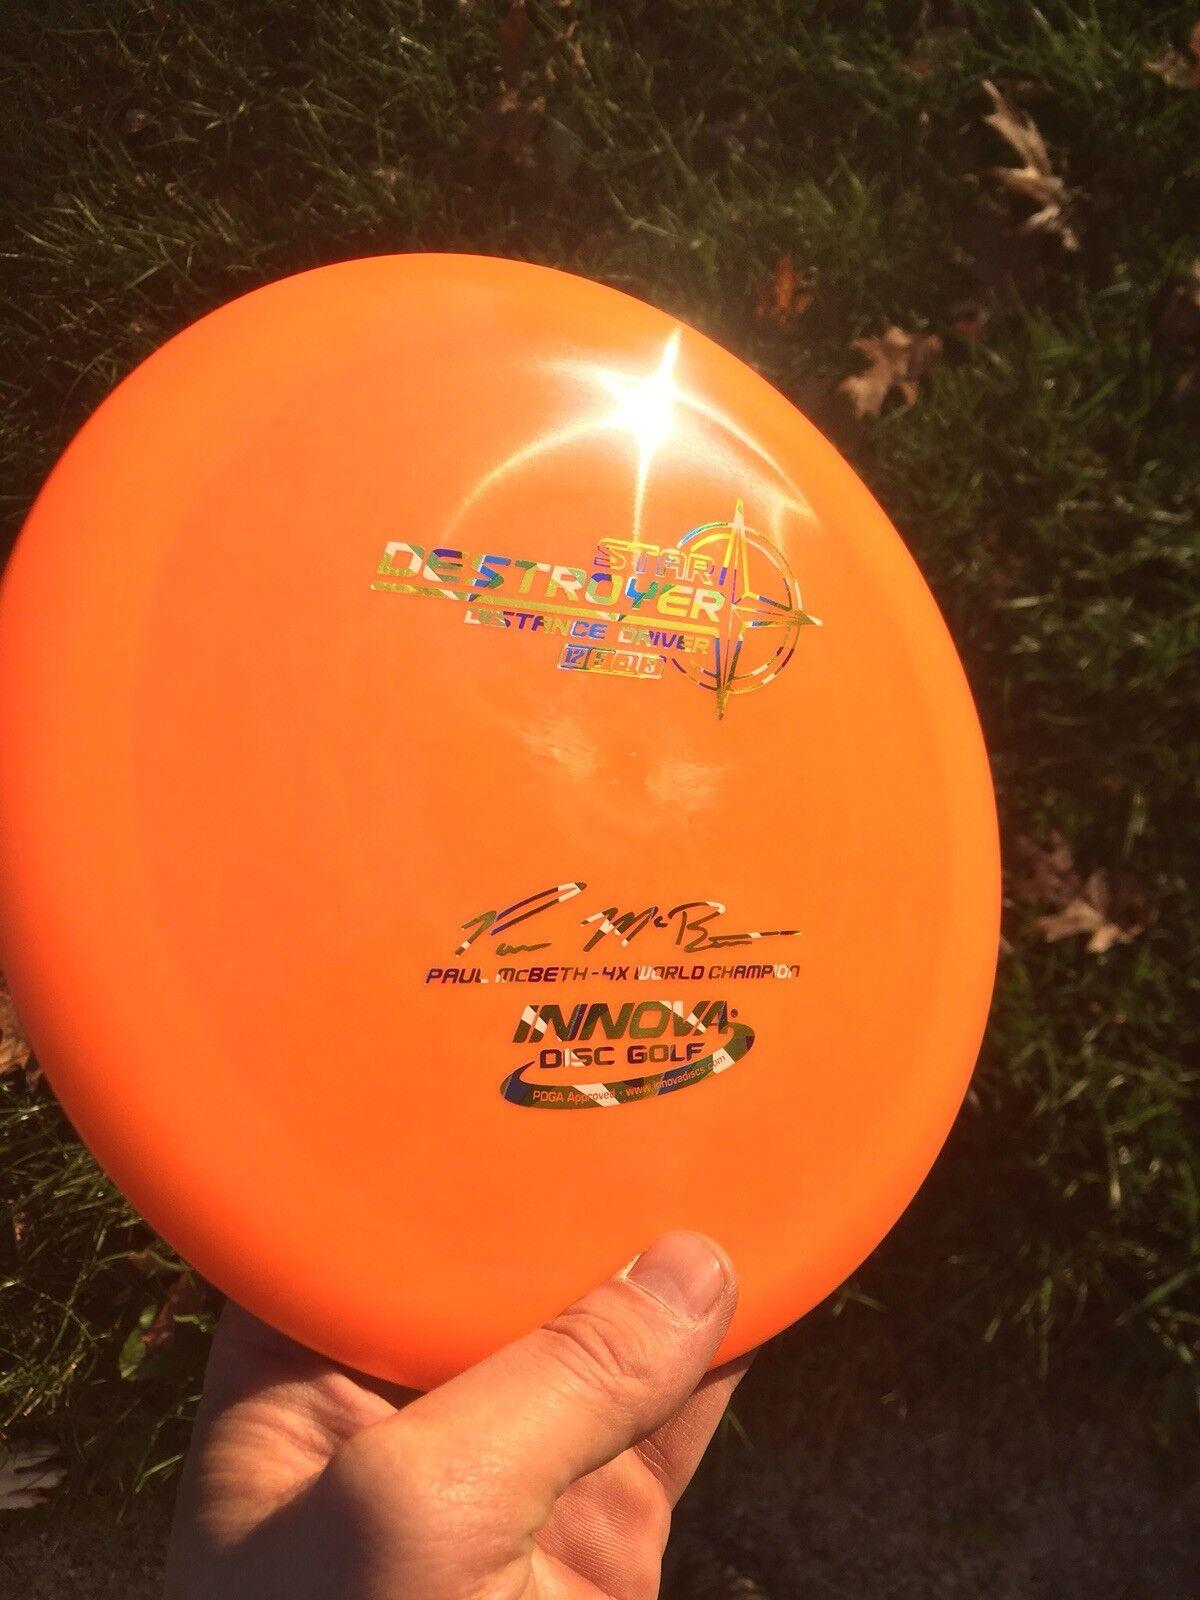 INNOVA STAR-LINE DESTROYER 175.01 GEOMETRIC GRAMS Orange W/COOL GEOMETRIC 175.01 HOT-STAMP 123850